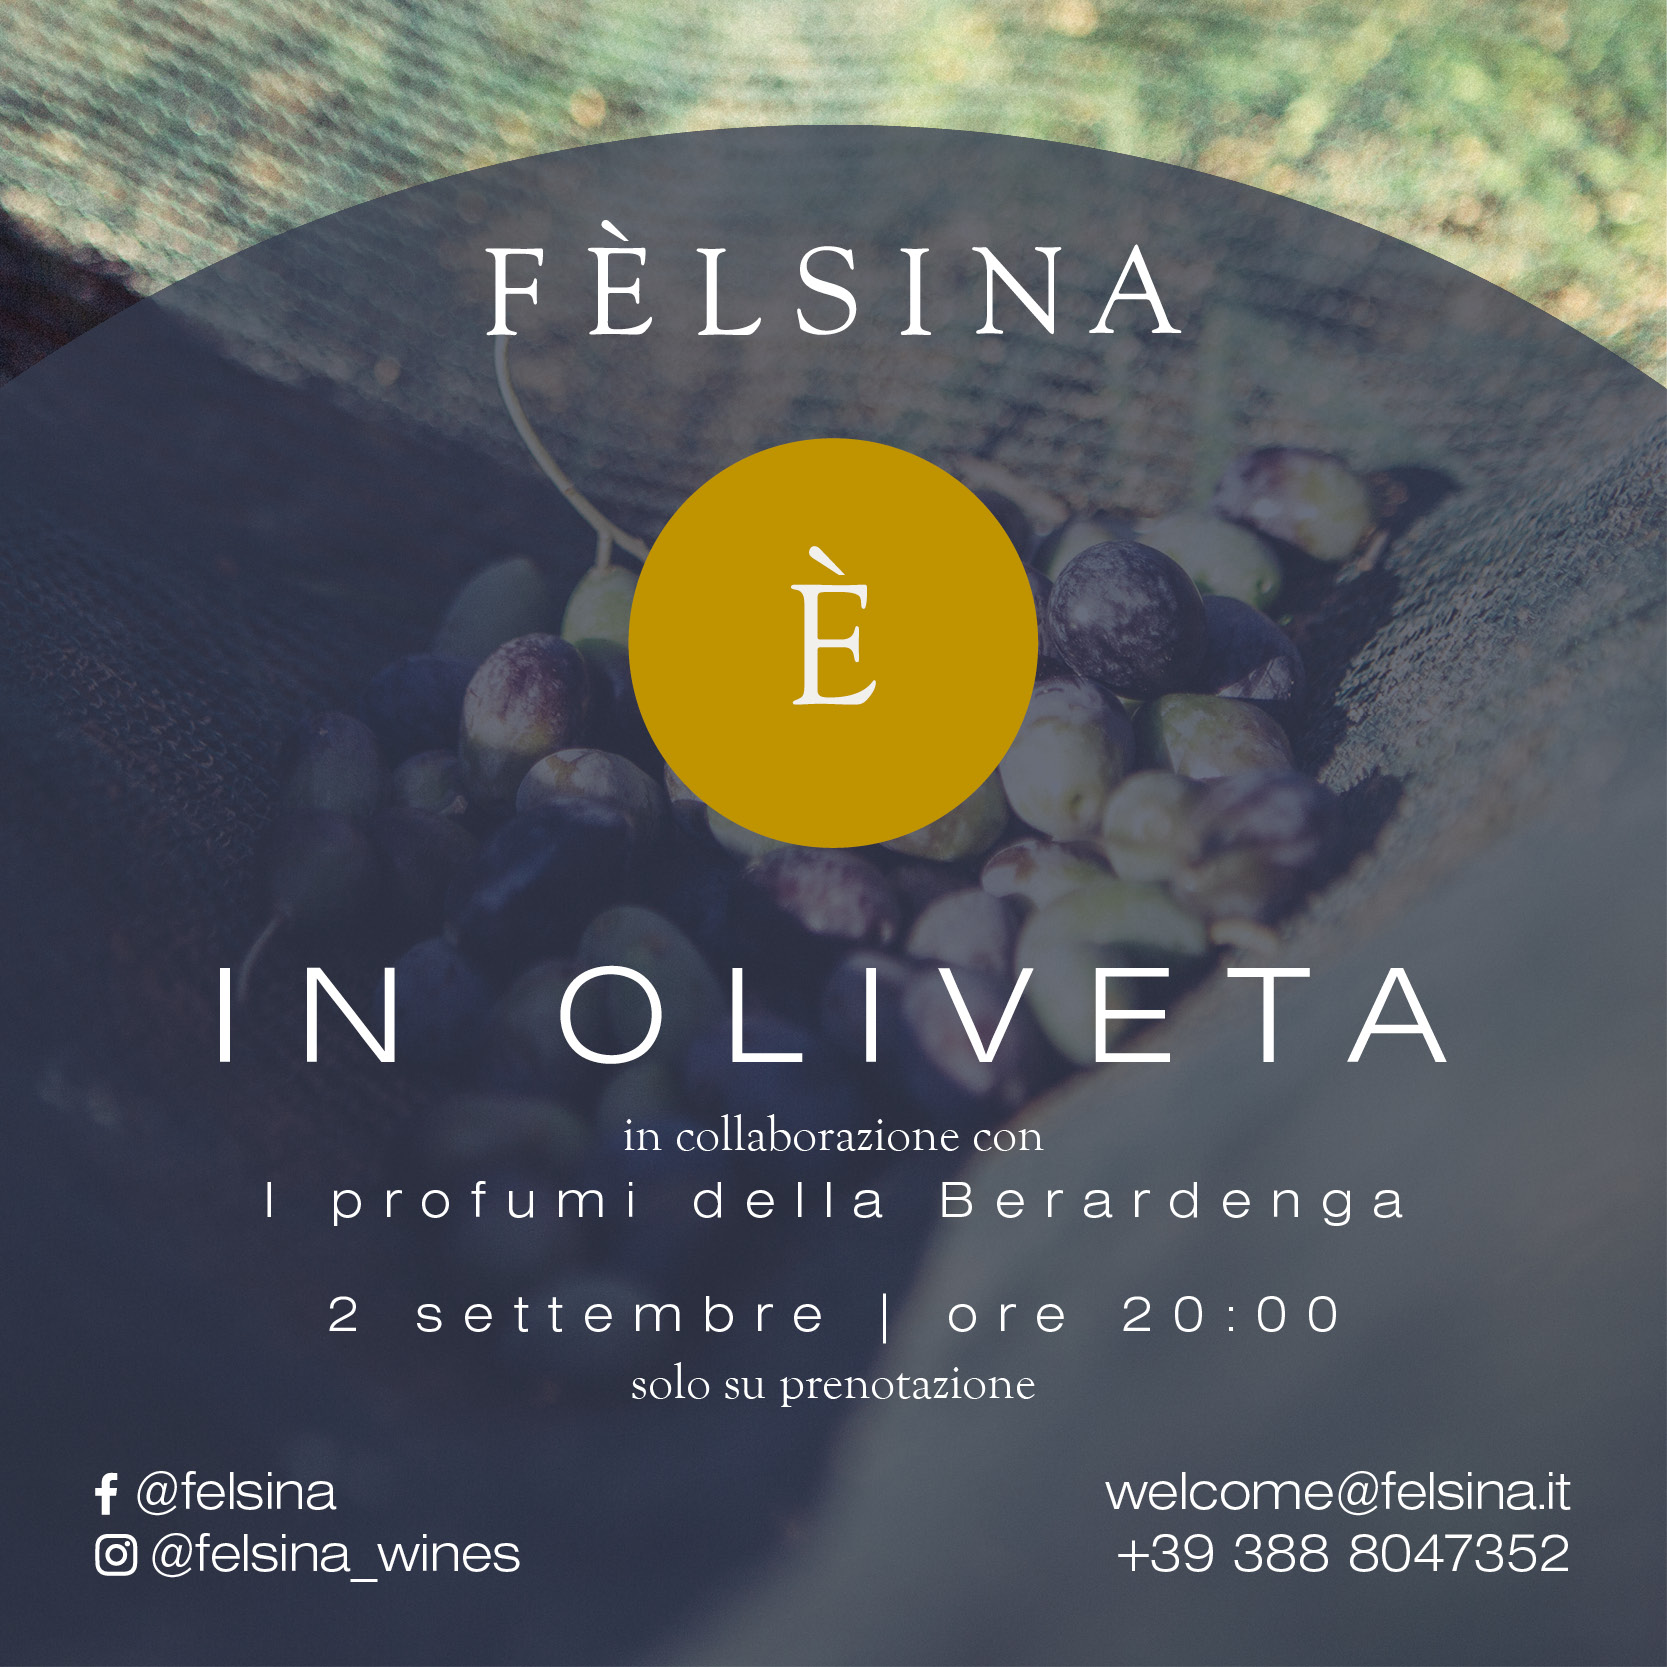 felsina-oliveta-profumi-della-berardenga_box